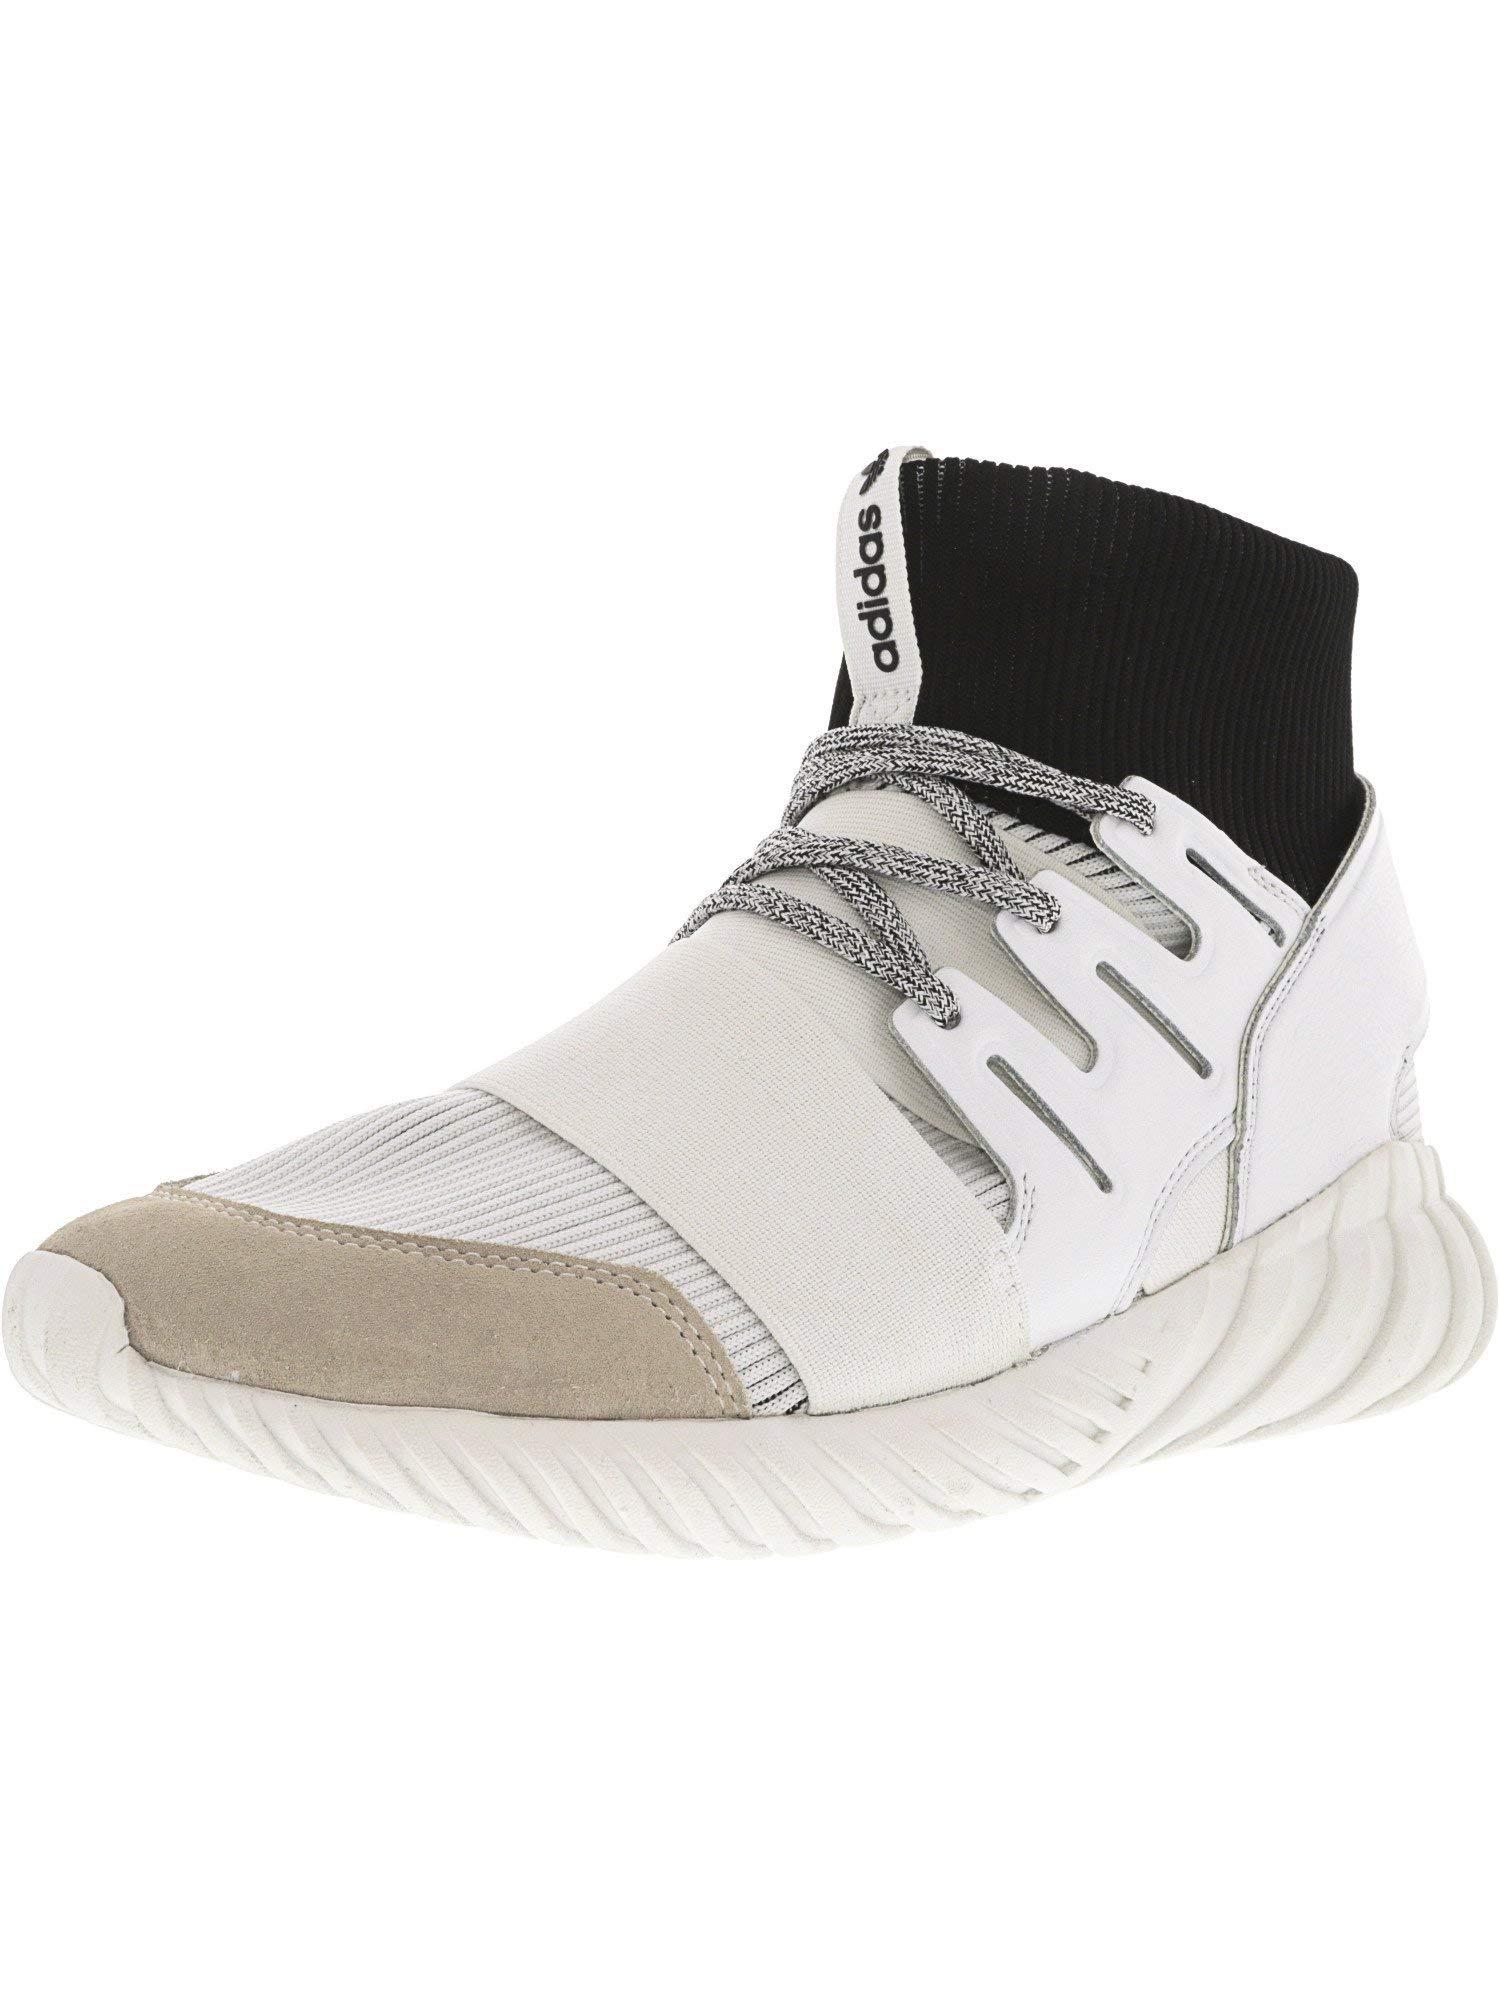 6050e096624e adidas Men's Tubular Doom Footwear White/Core Black High-Top Fashion  Sneaker - 12M